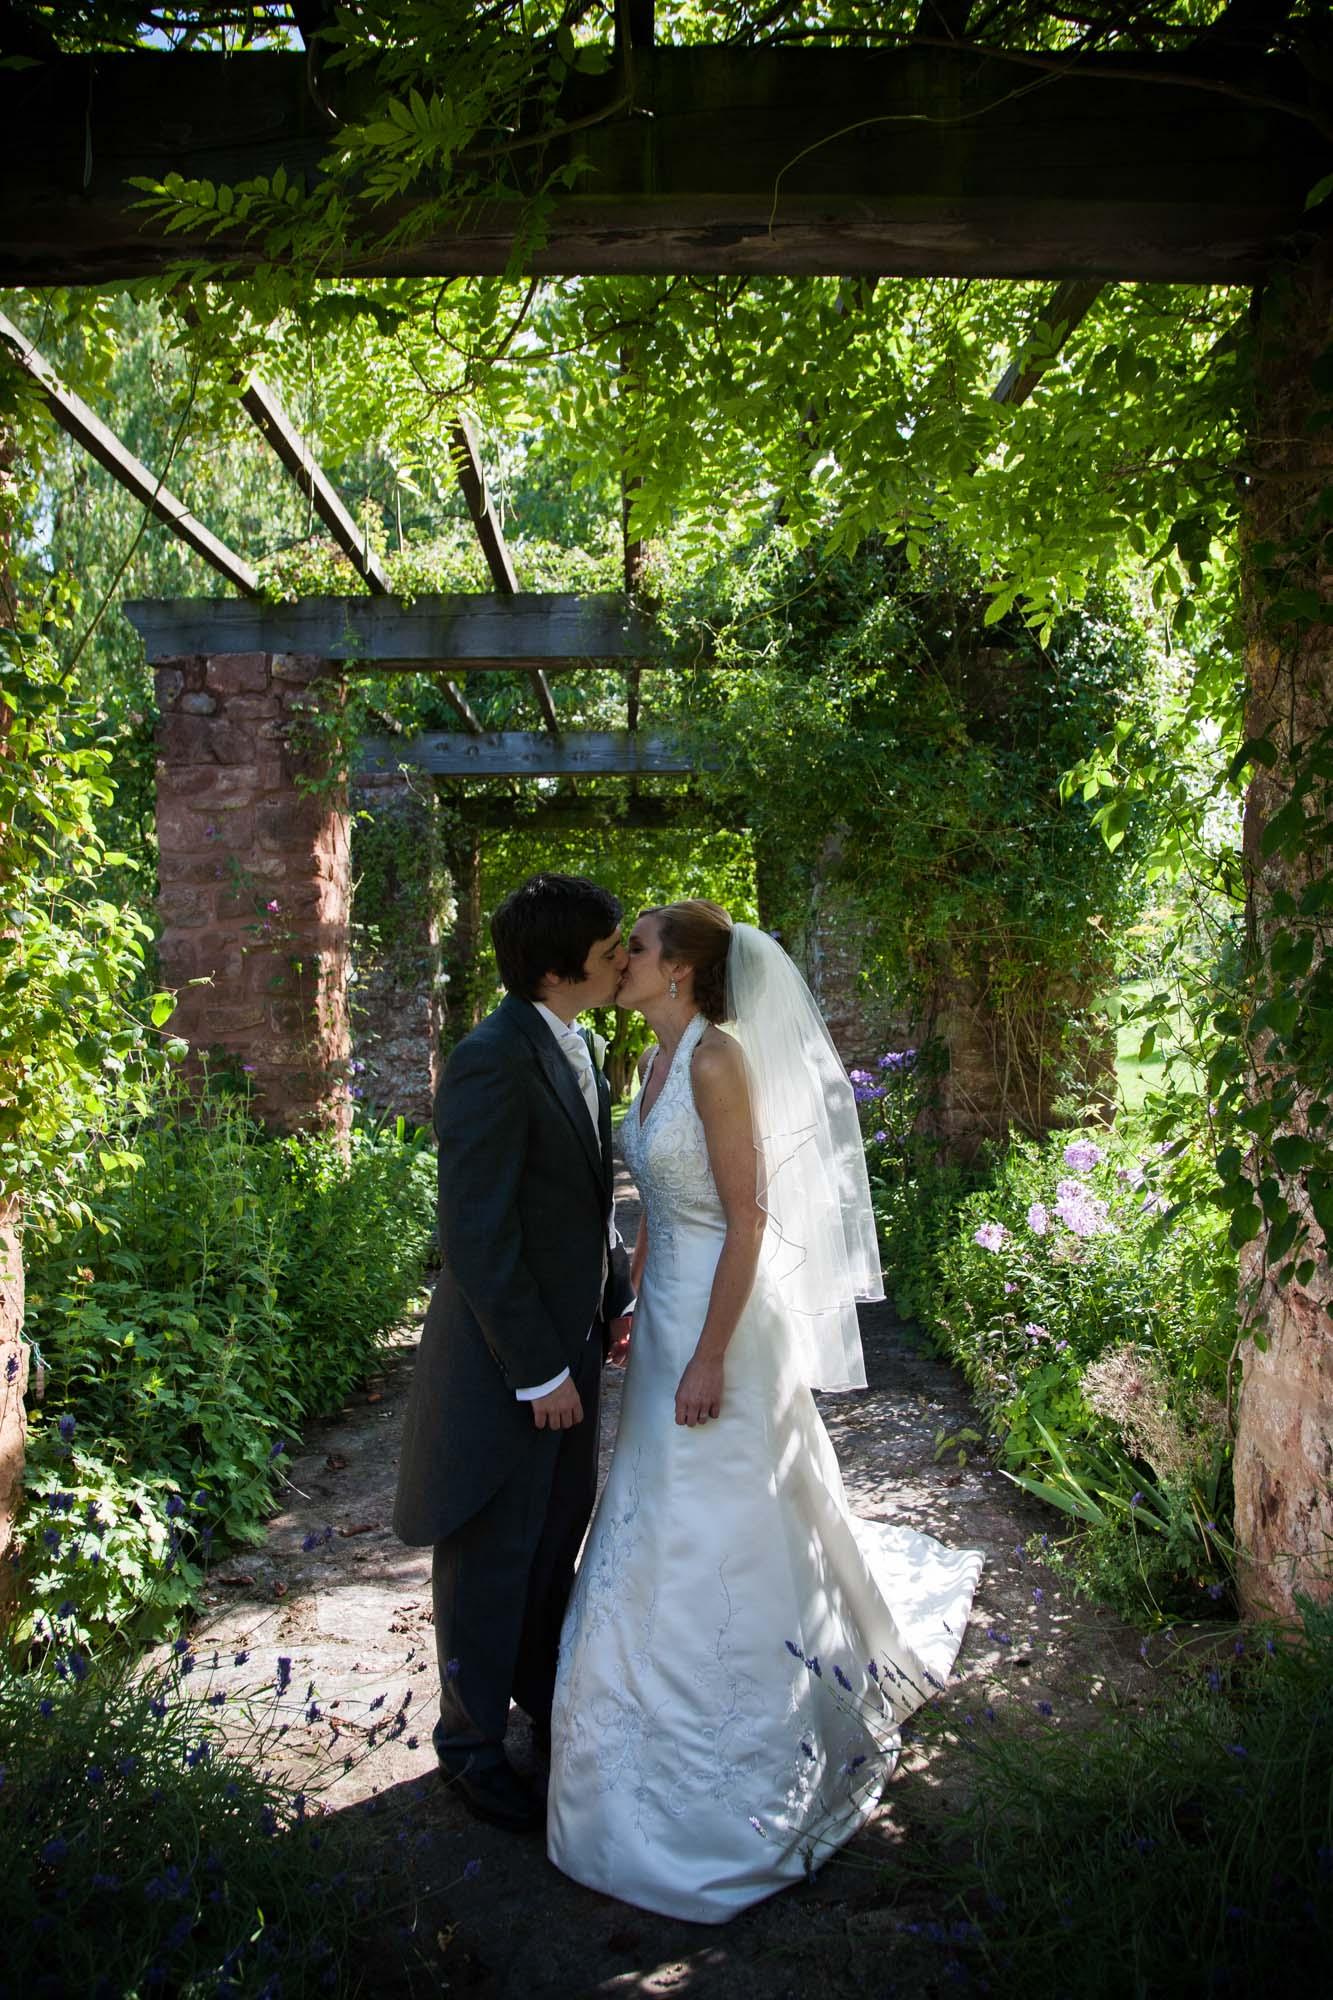 weddings-couples-love-photographer-oxford-london-jonathan-self-photography-76.jpg